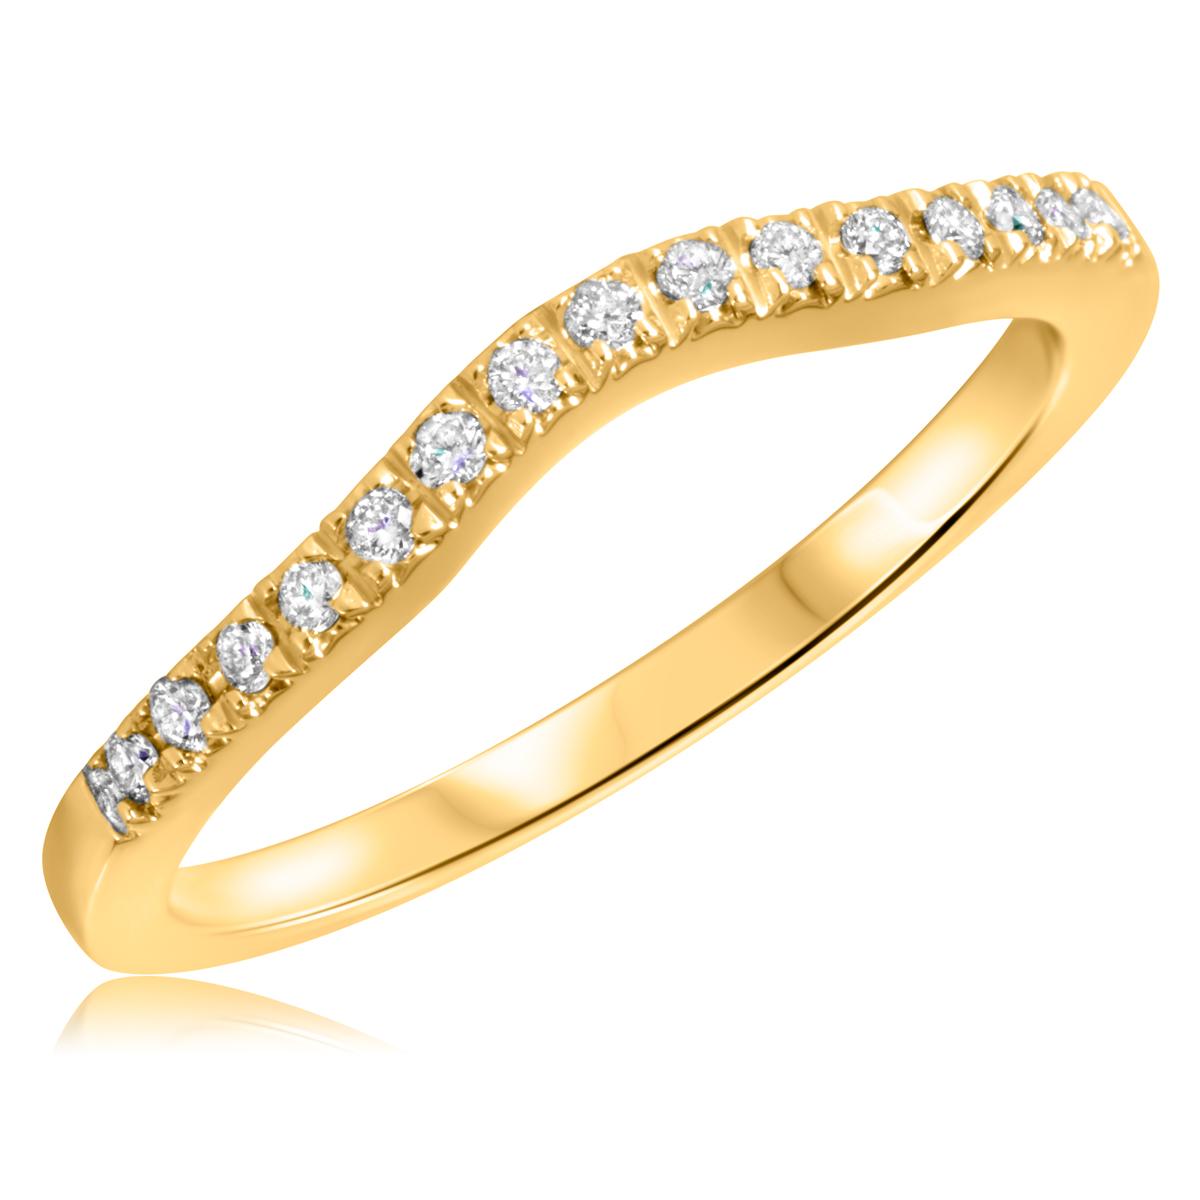 1/8 Carat T.W. Round Cut Diamond Ladies Wedding Band 10K Yellow Gold- Size 8